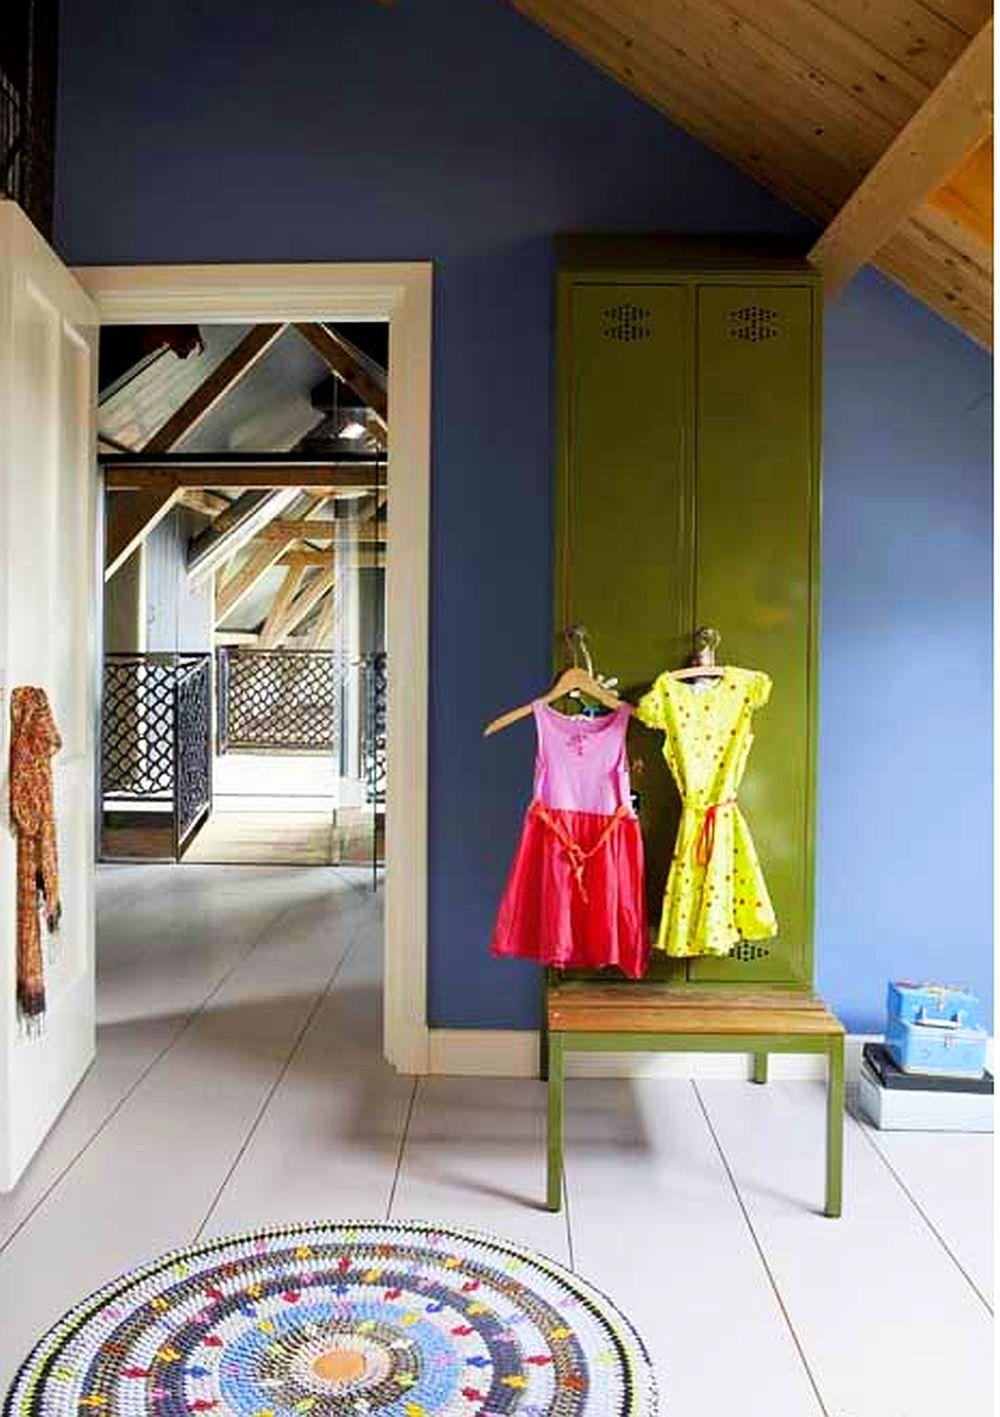 adelaparvu.com about modern farm, designer Larissa van Seumeren, Photo Viva Vida and Living Agency (19)